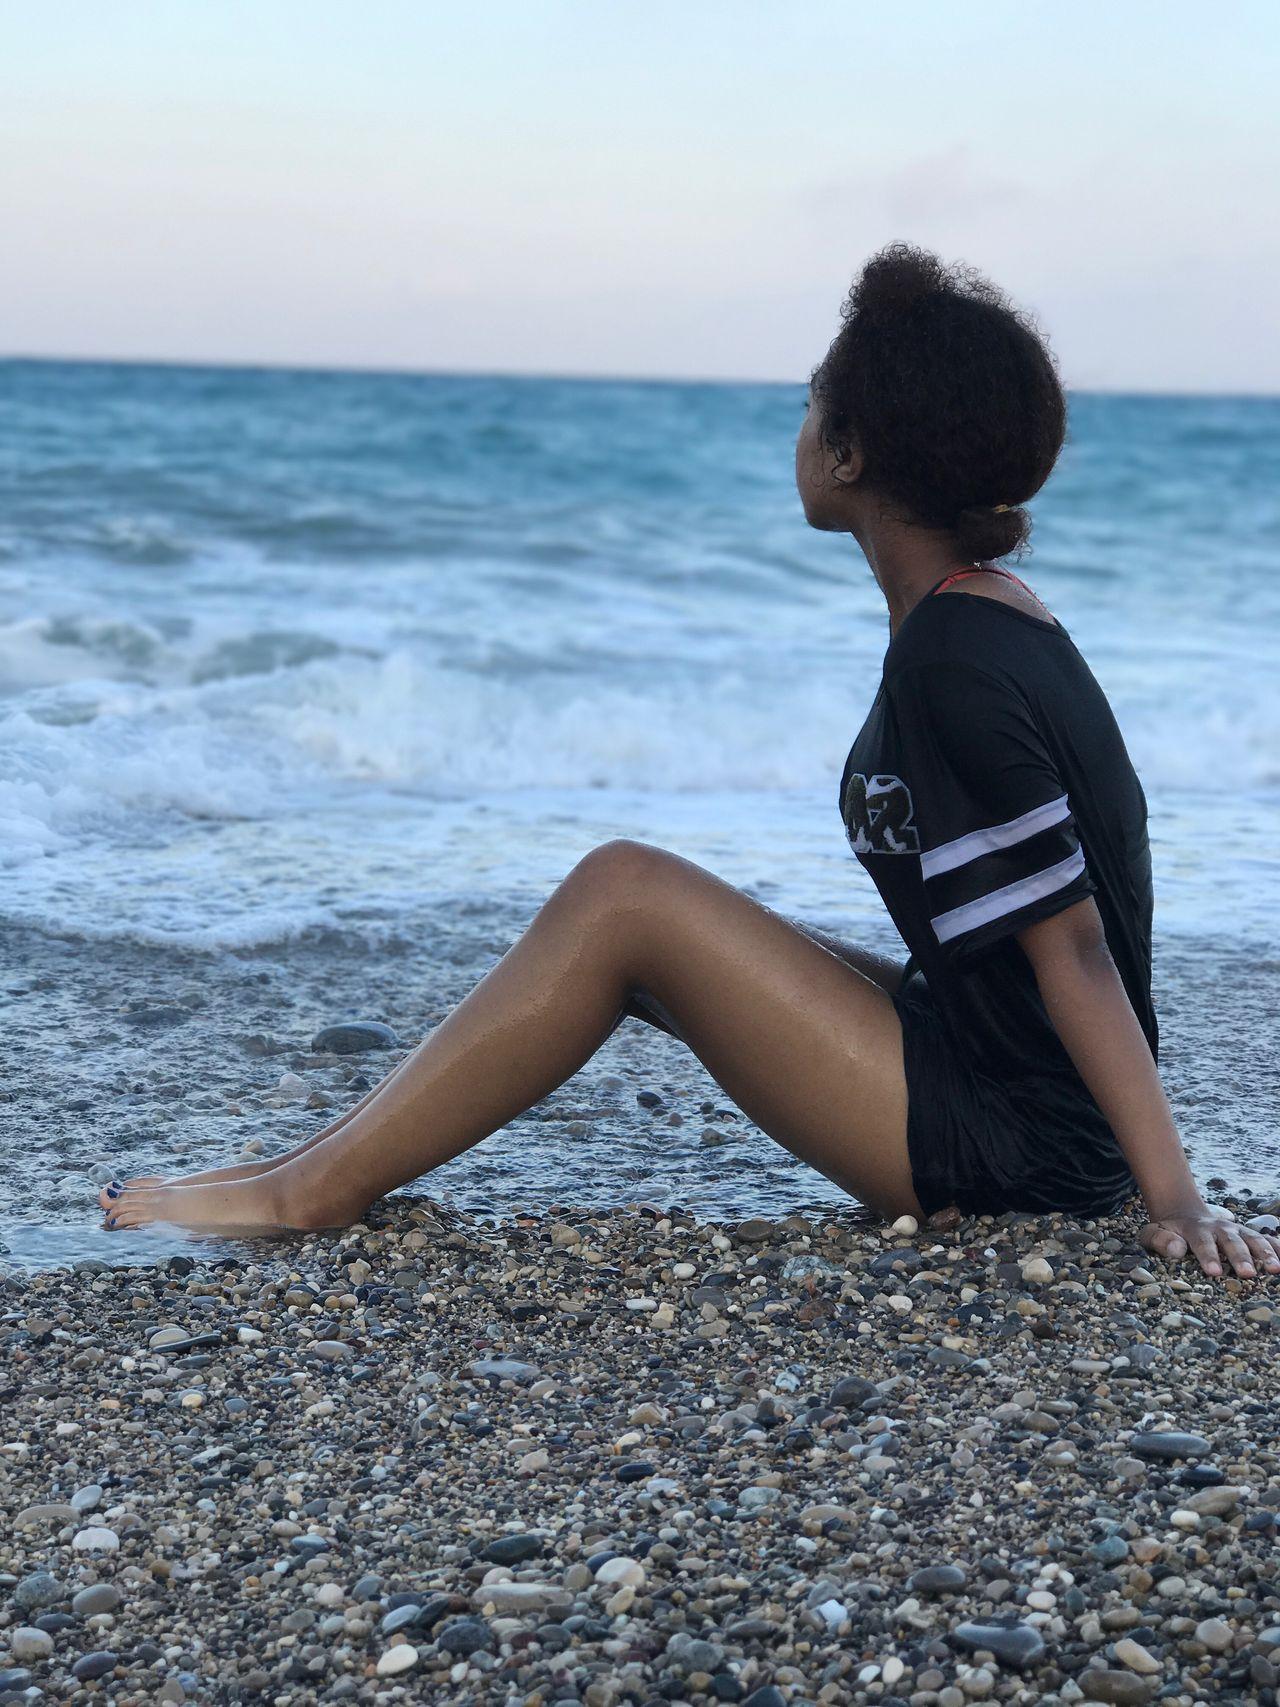 Daddy's girl, natural, beauty, wondering, gazing, natural hair, beach, france